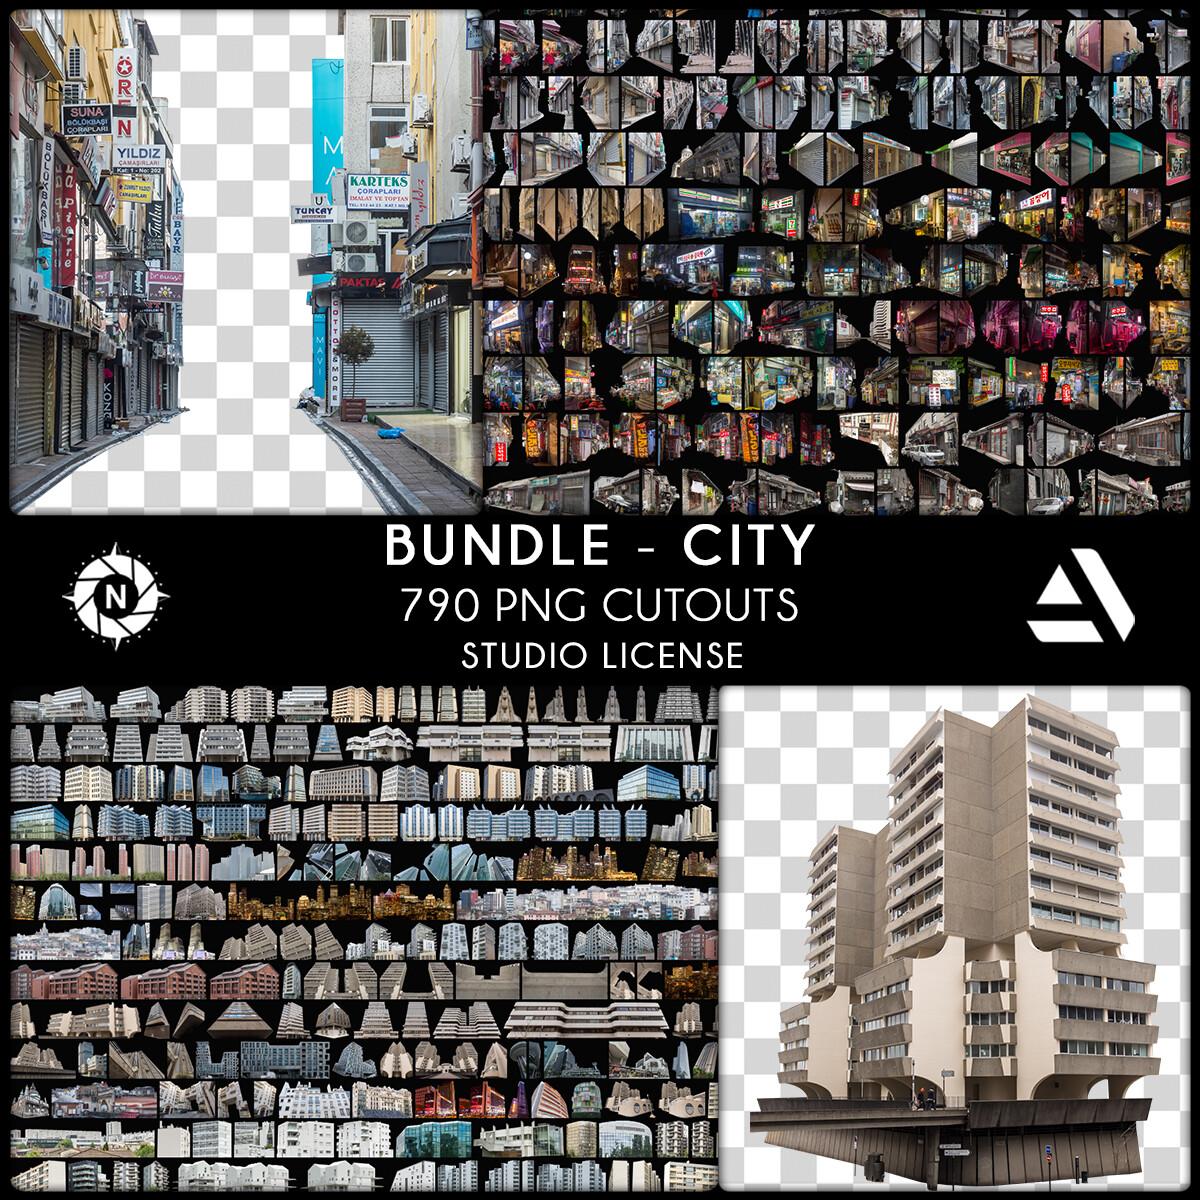 Bundle PNG Photo Packs: City - Studio License  https://www.artstation.com/a/6069216